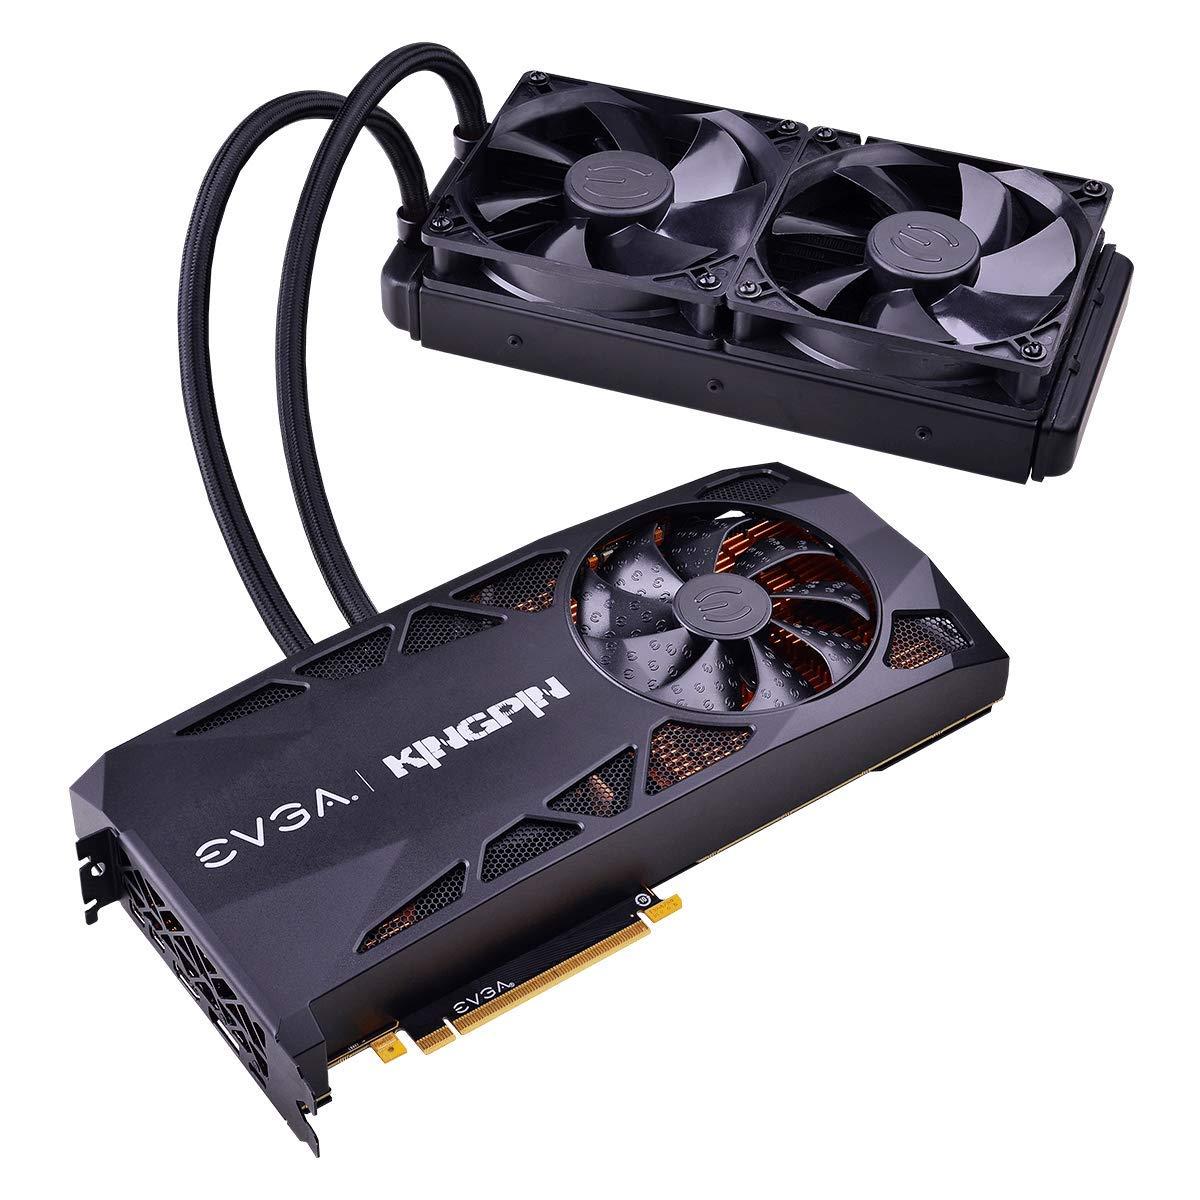 EVGA GeForce RTX 2080 Ti K NGP N Gaming, 11GB GDDR6, iCX2 Technology,  Hybrid Cooler, OLED Display, Metal Backplate, 11G-P4-2589-KR